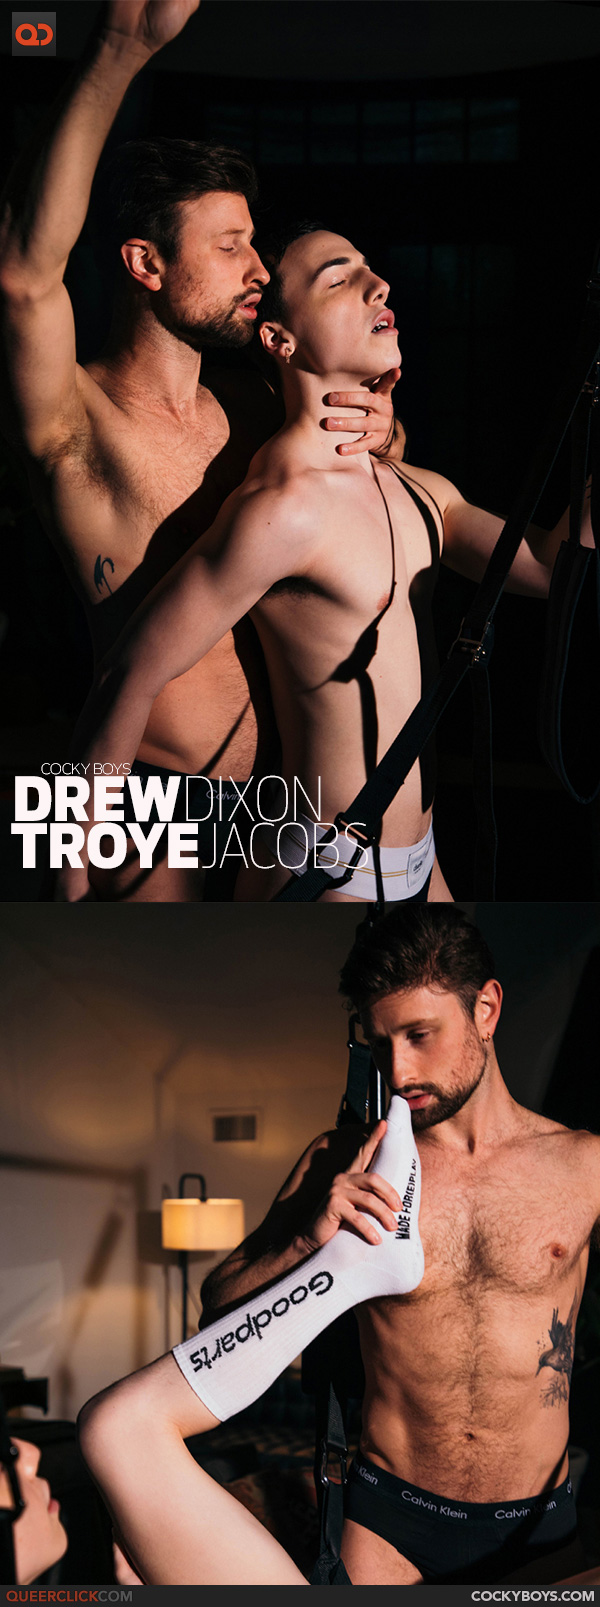 CockyBoys: Drew Dixon and Troye Jacobs